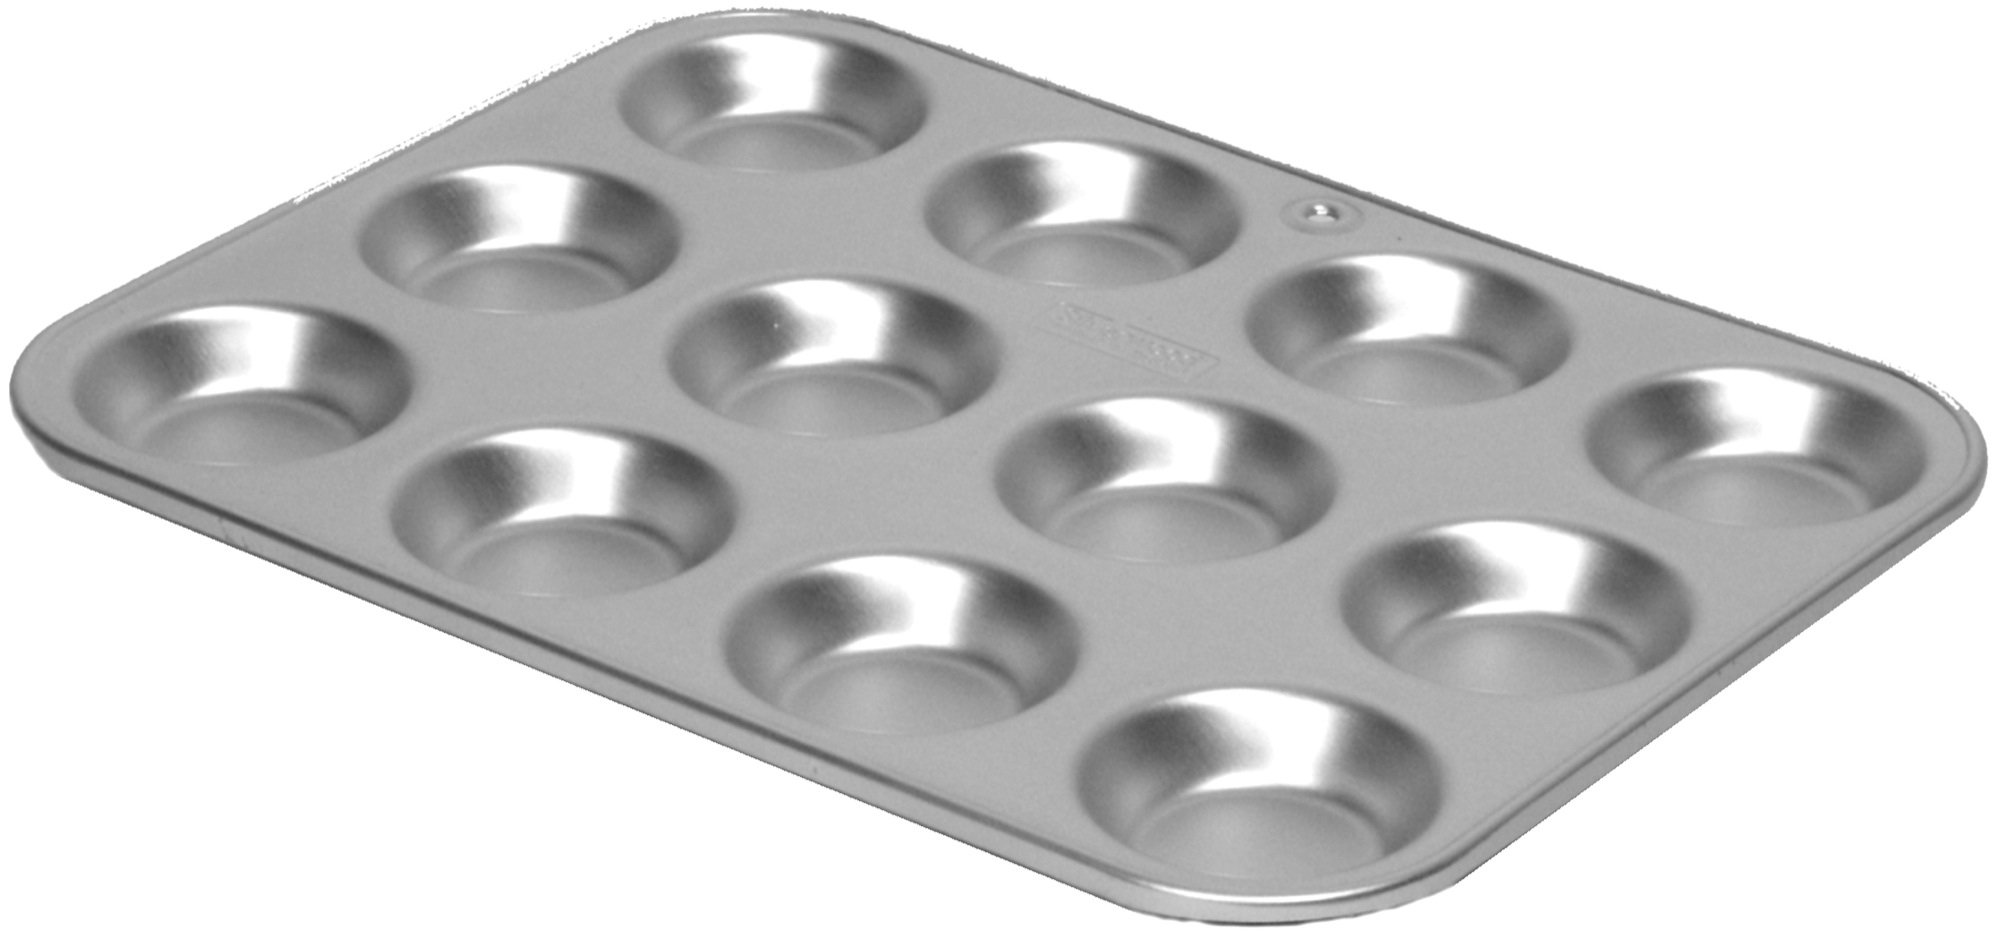 Alan Silverwood 12 x 9'' 12 Hole Tart Tarte Tray Pan 33522